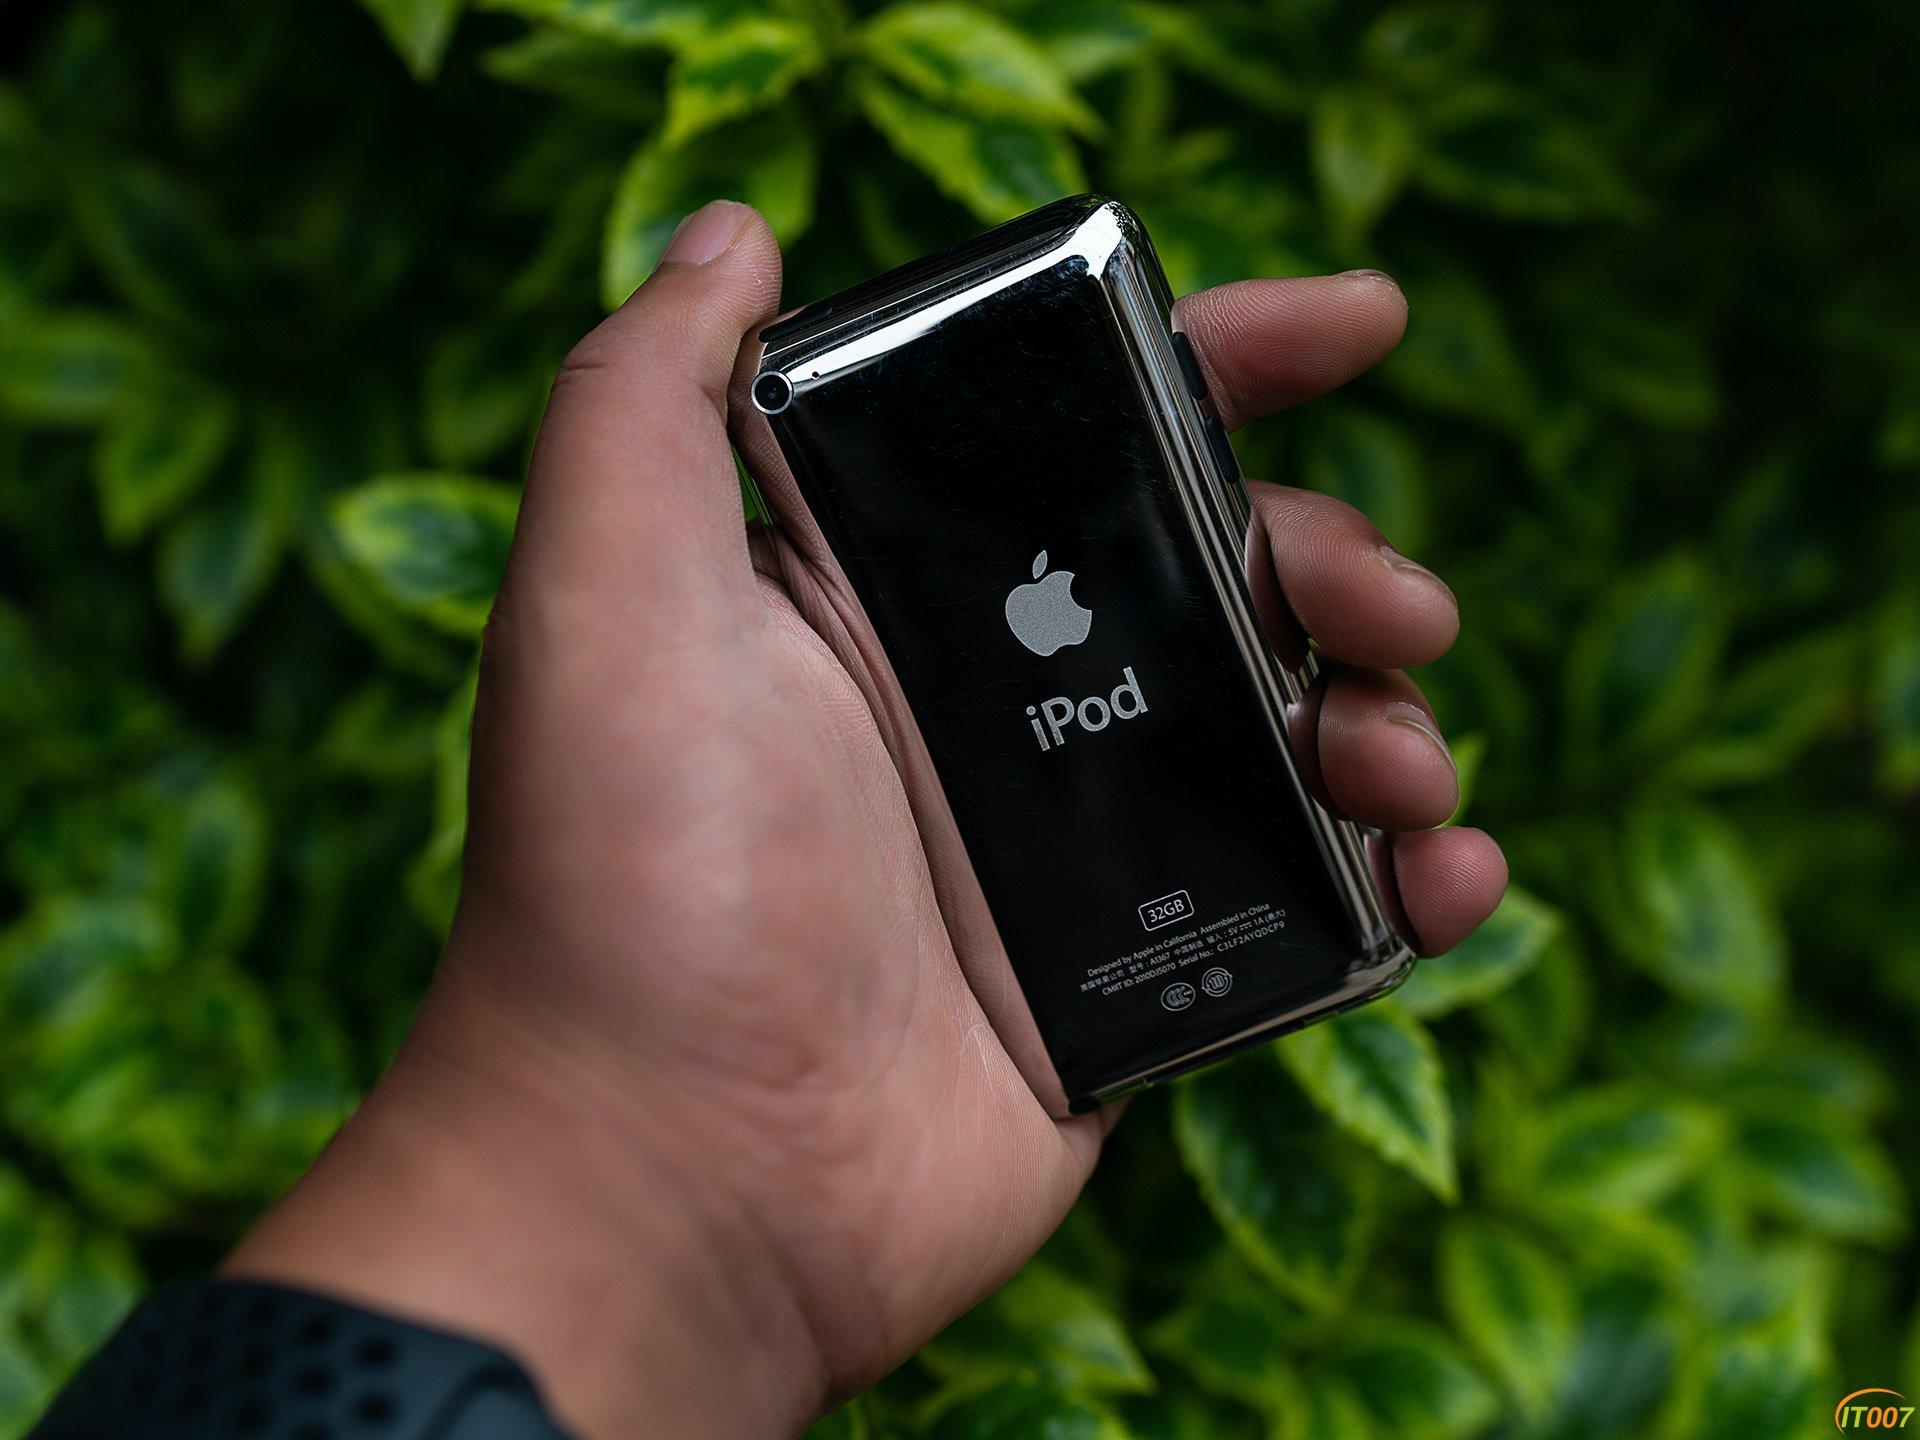 R6400路由器 电钢琴 大疆osmo 苹果 sony黑卡相机等小东西